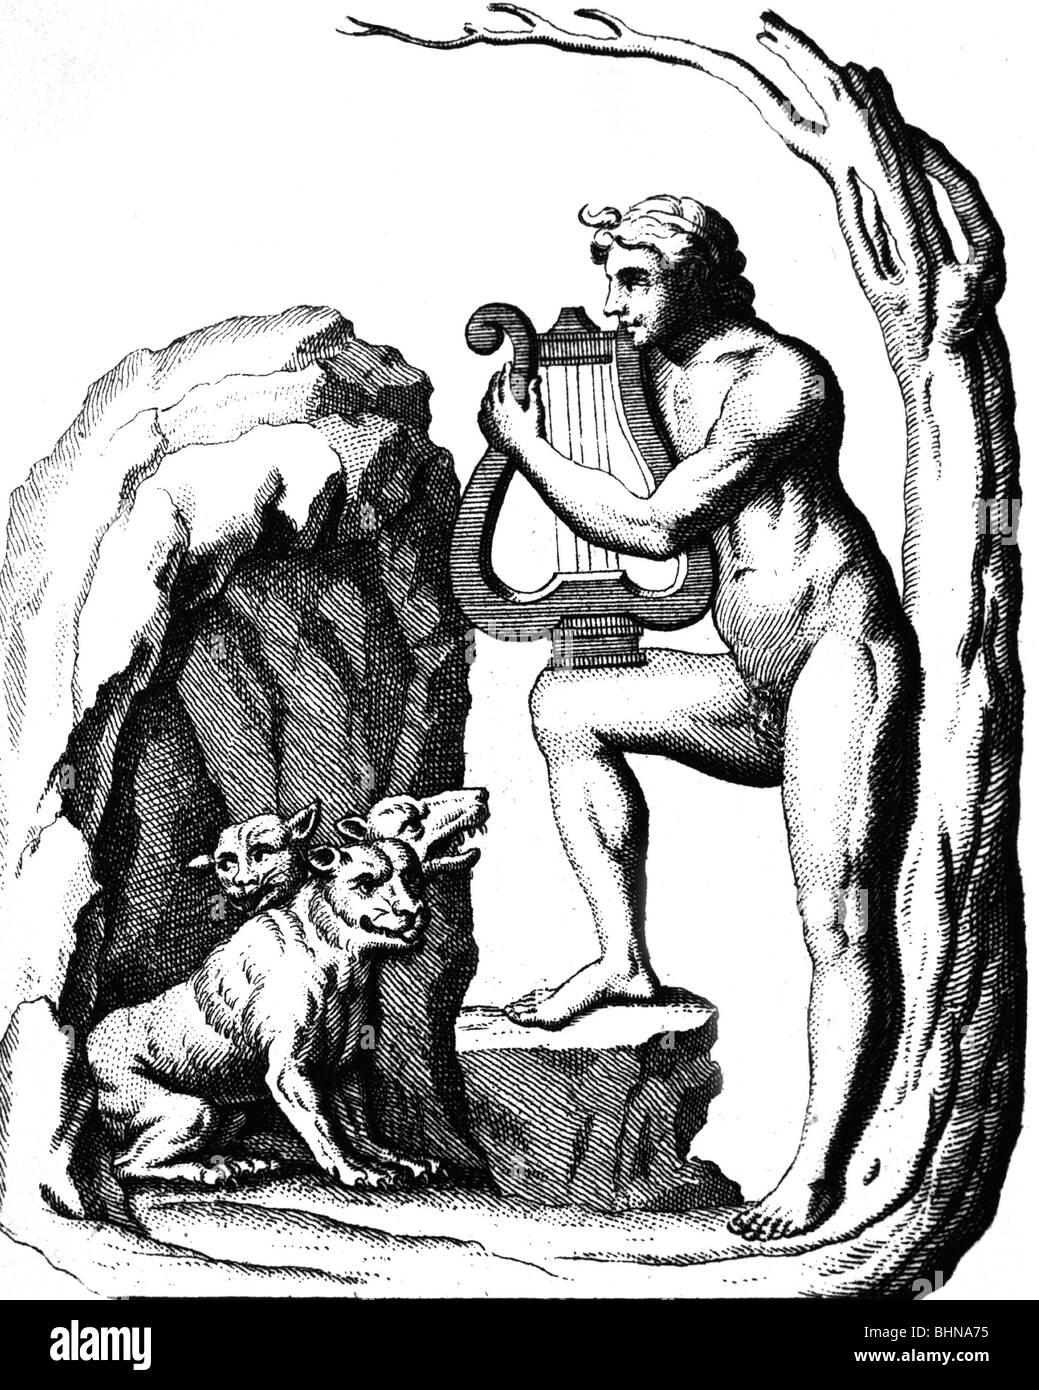 orpheus playing lyre stock photos u0026 orpheus playing lyre stock